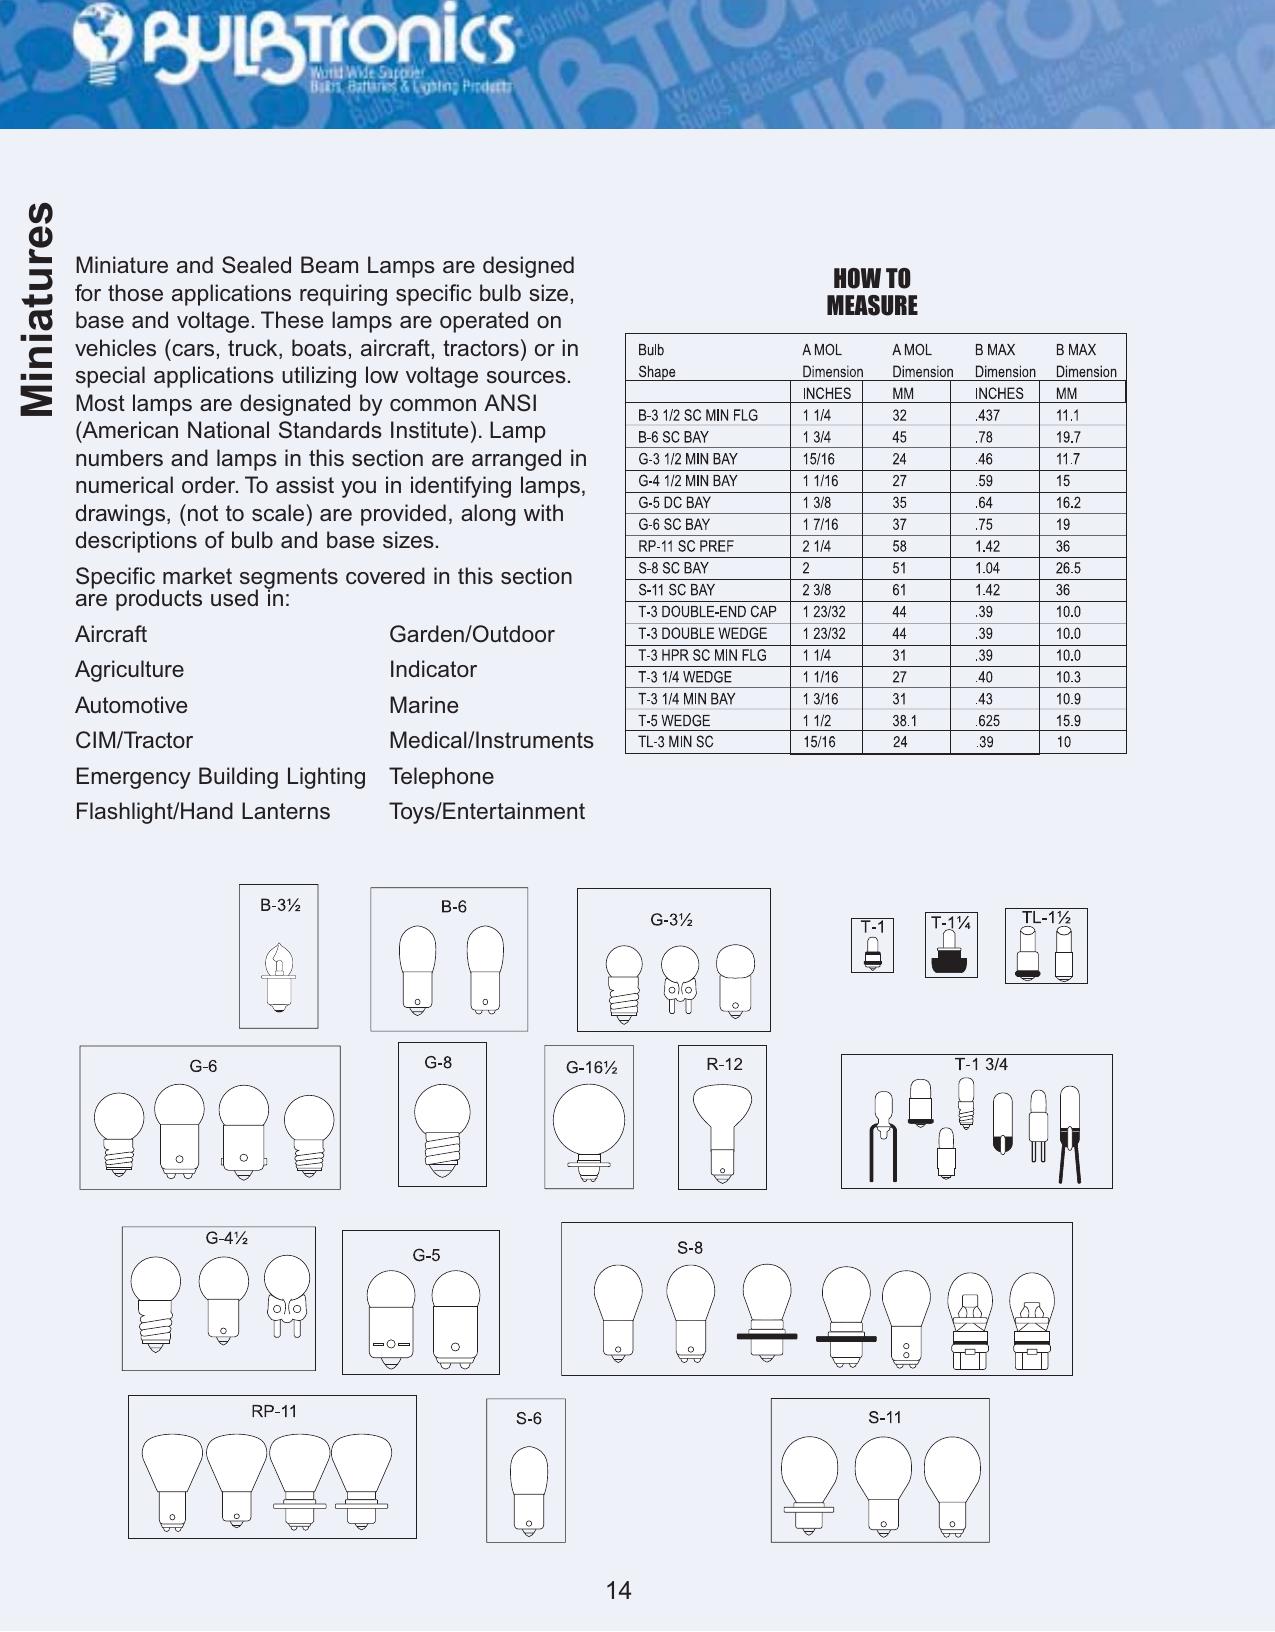 GE Halogen 10 Watt 12 Volt Landscape Lighting 2 Bulbs per Pack G4 Q10T3 LAND-CD2